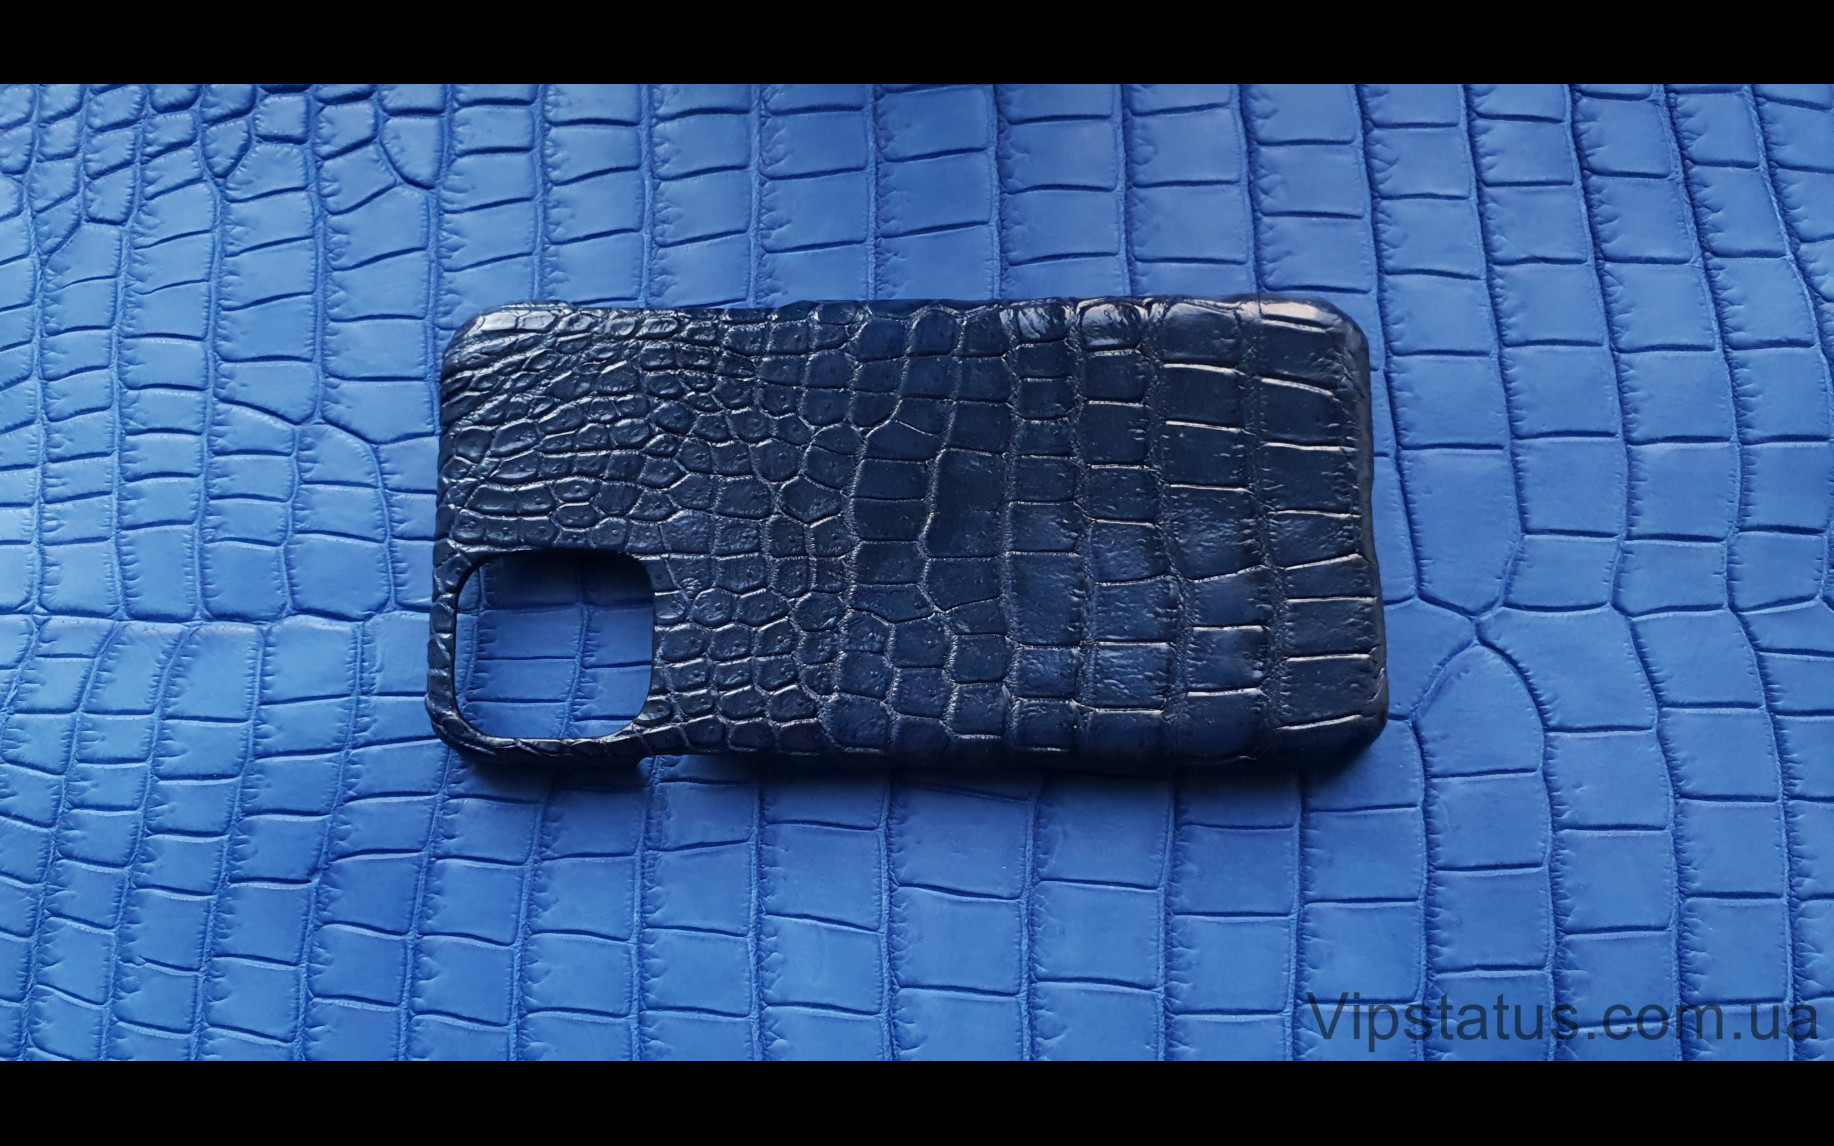 Elite Dark Blue Вип чехол IPhone 11 Pro Max кожа крокодила Dark Blue Vip case IPhone 11 Pro Max Crocodile leather image 4